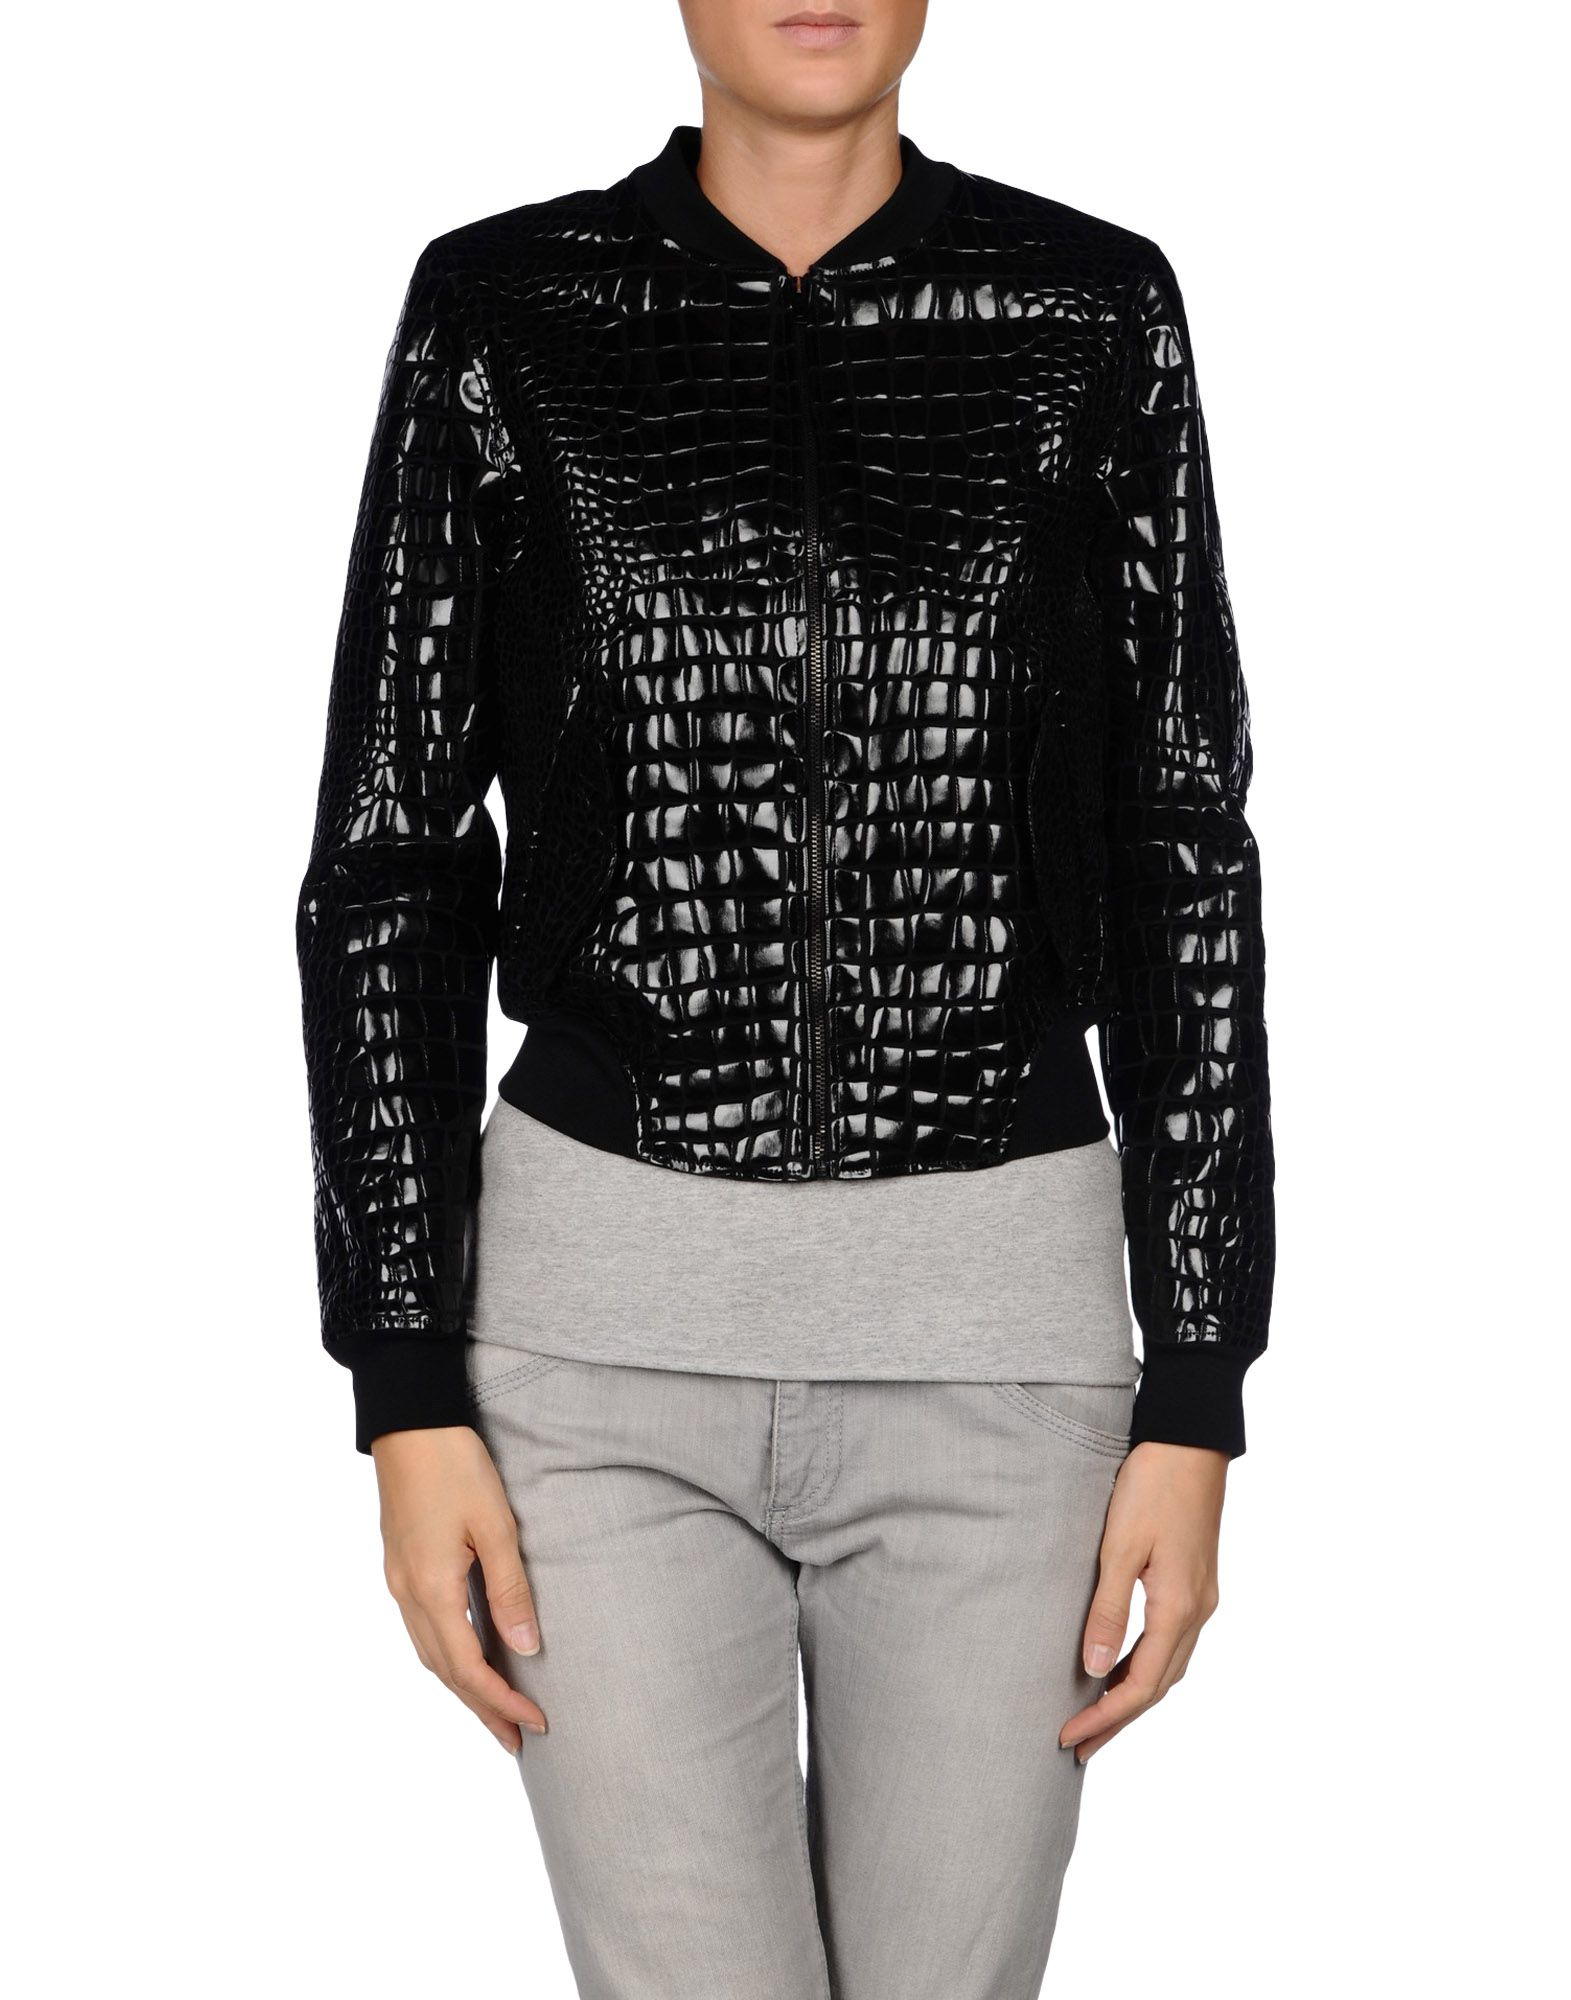 Lyst mm6 by maison martin margiela jacket in black for Mm6 maison martin margiela